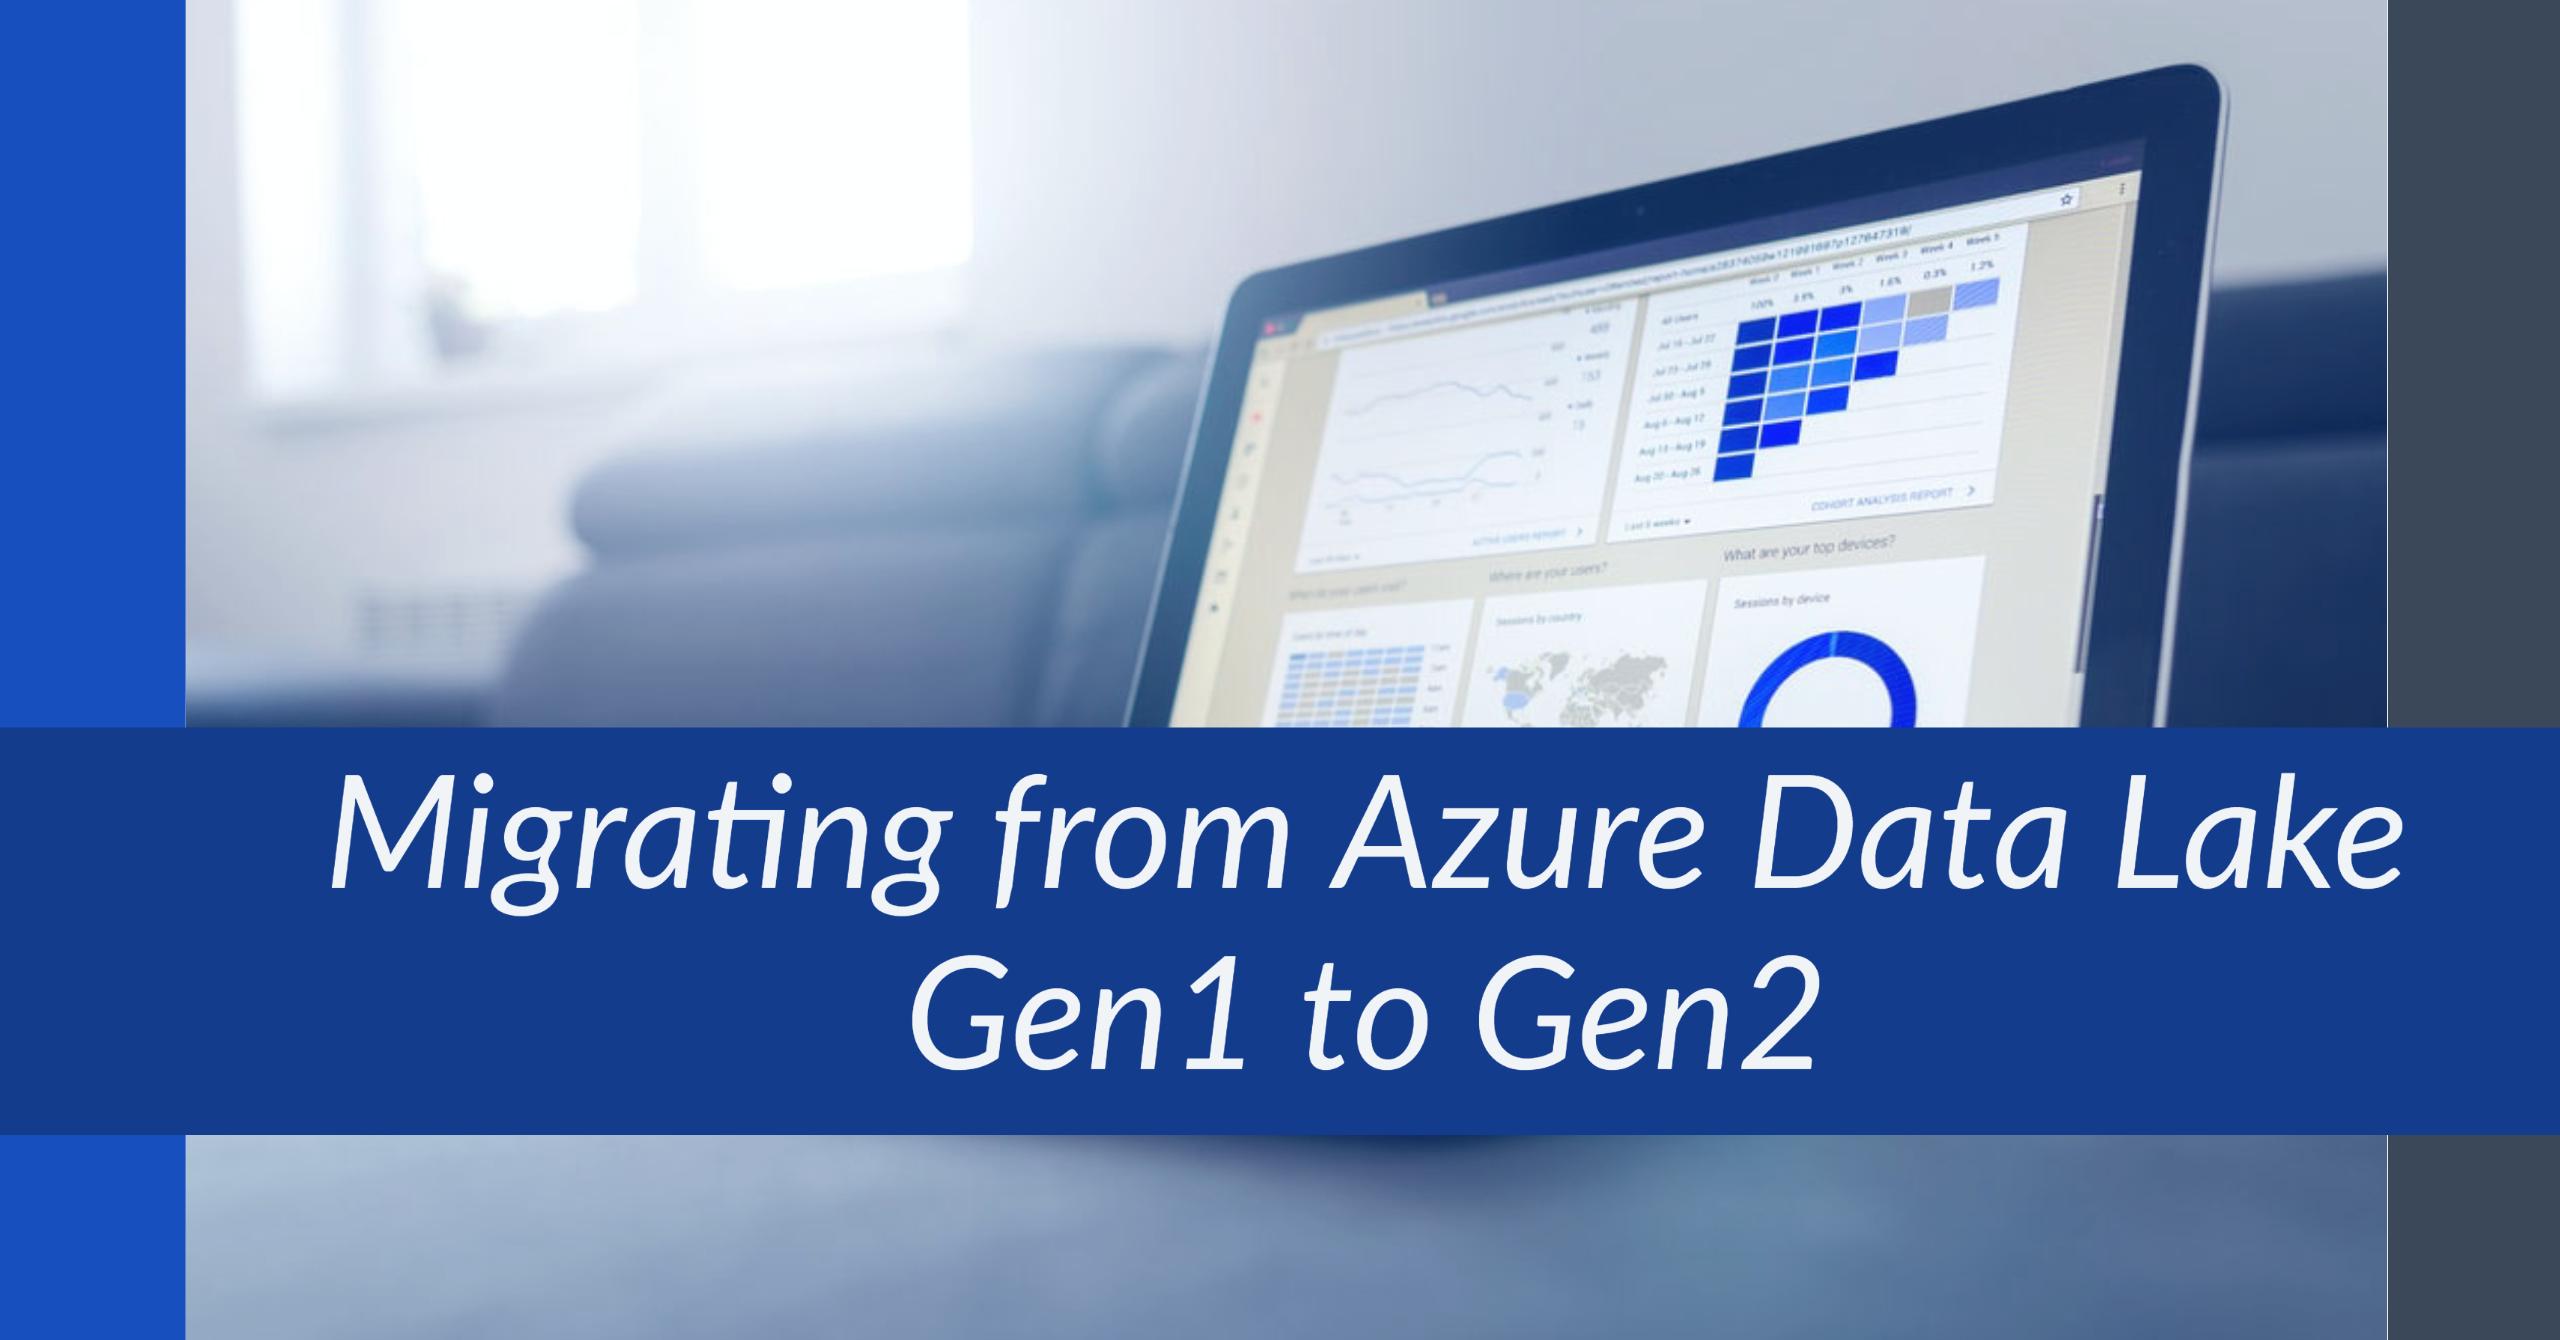 Migrating from Azure Data Lake Gen1 to Gen2